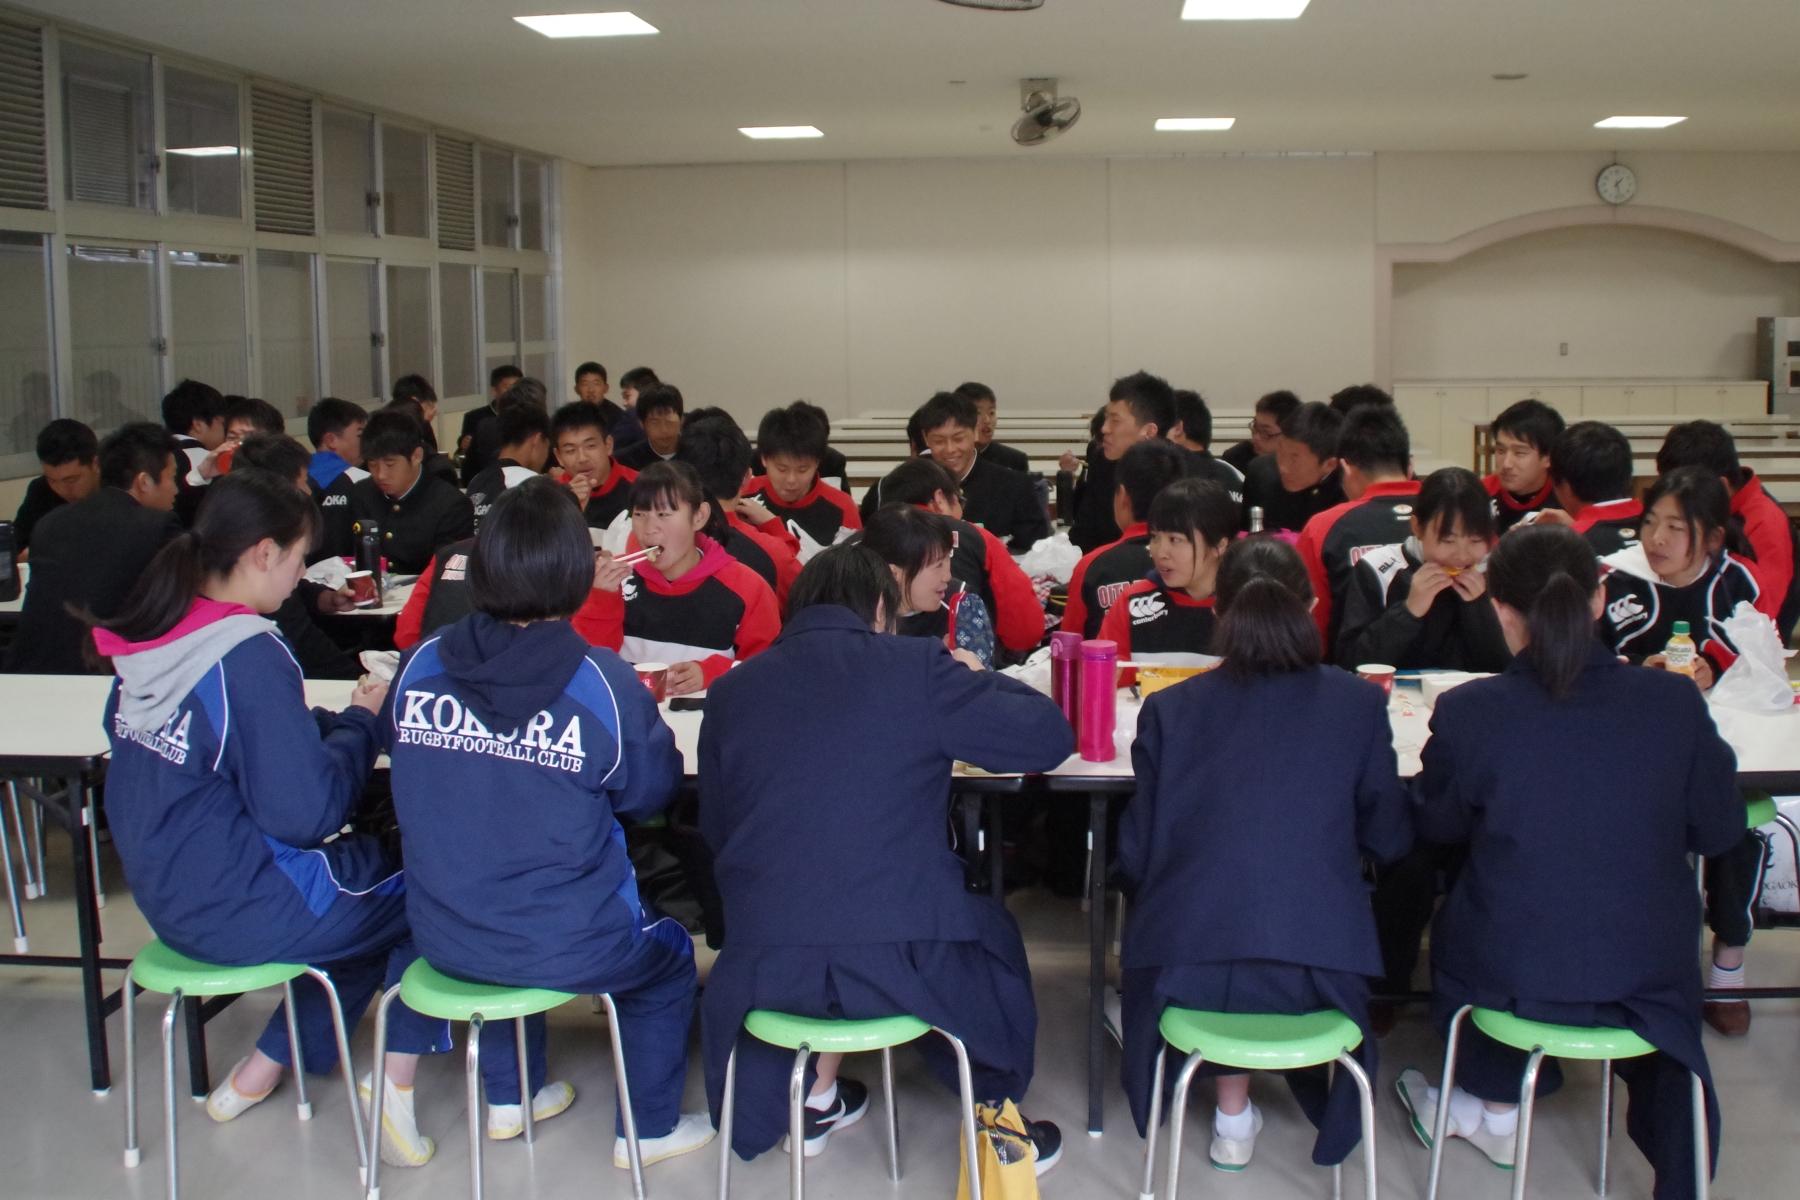 http://kokura-rugby.sakura.ne.jp/180407_132904.jpg